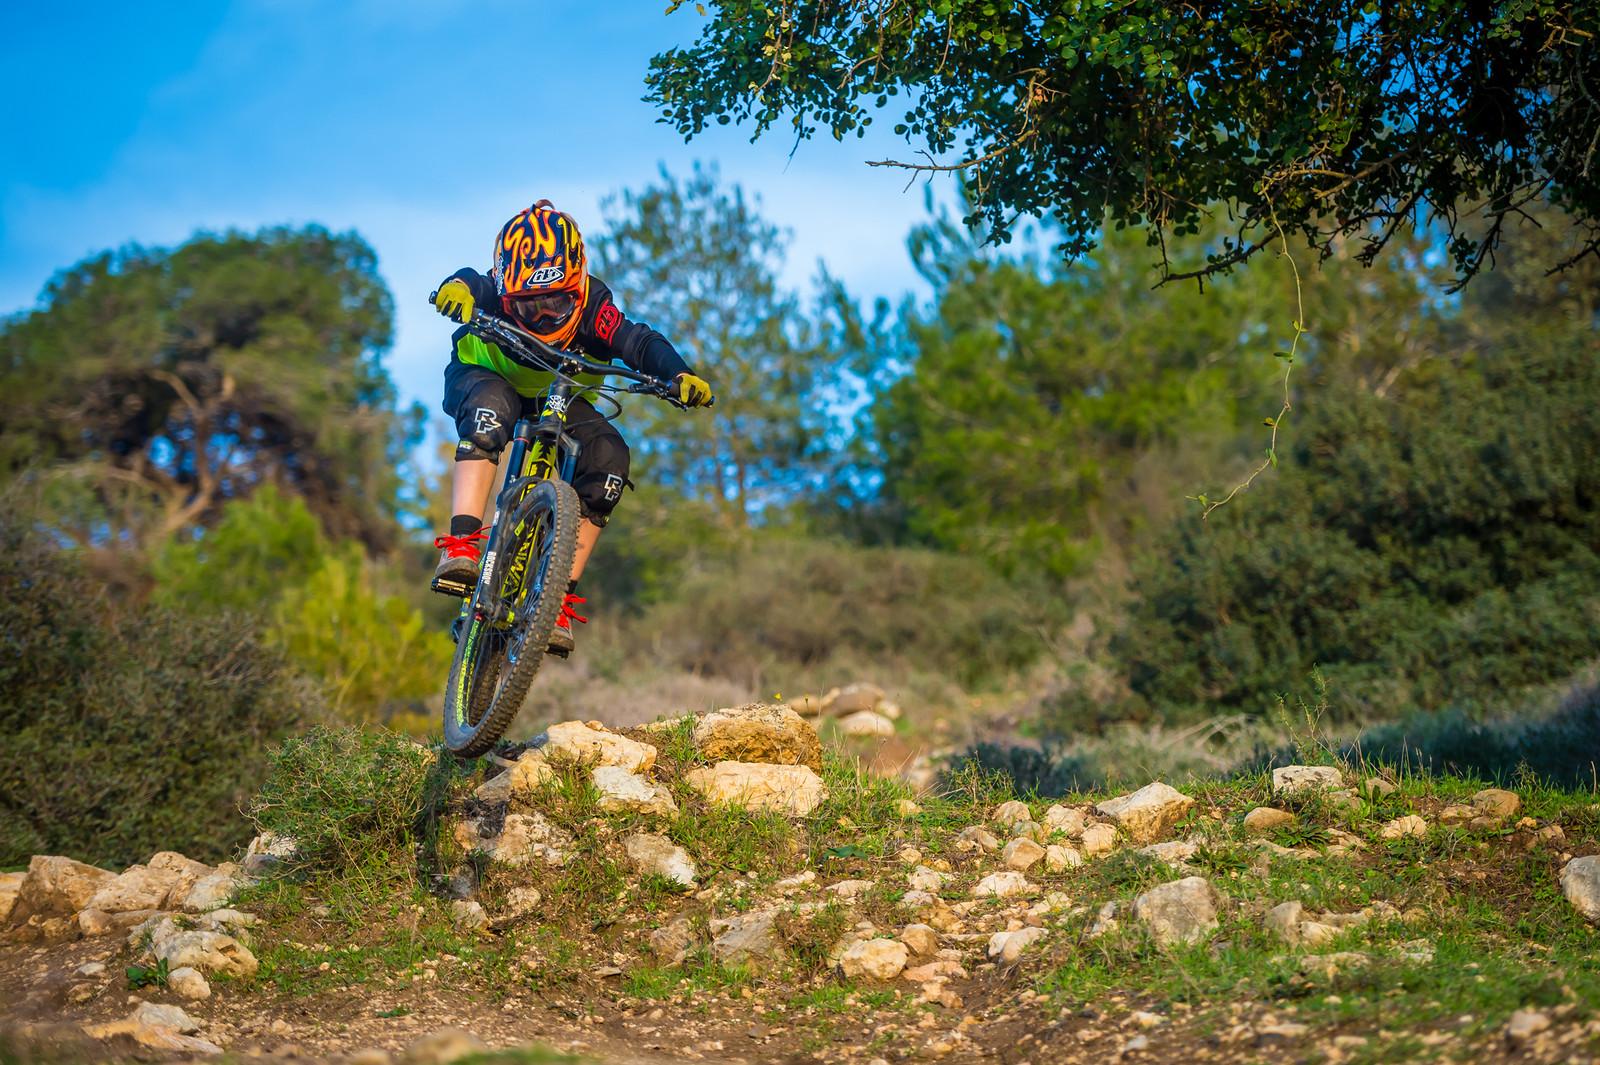 Droppy Scrubby - iceman2058 - Mountain Biking Pictures - Vital MTB